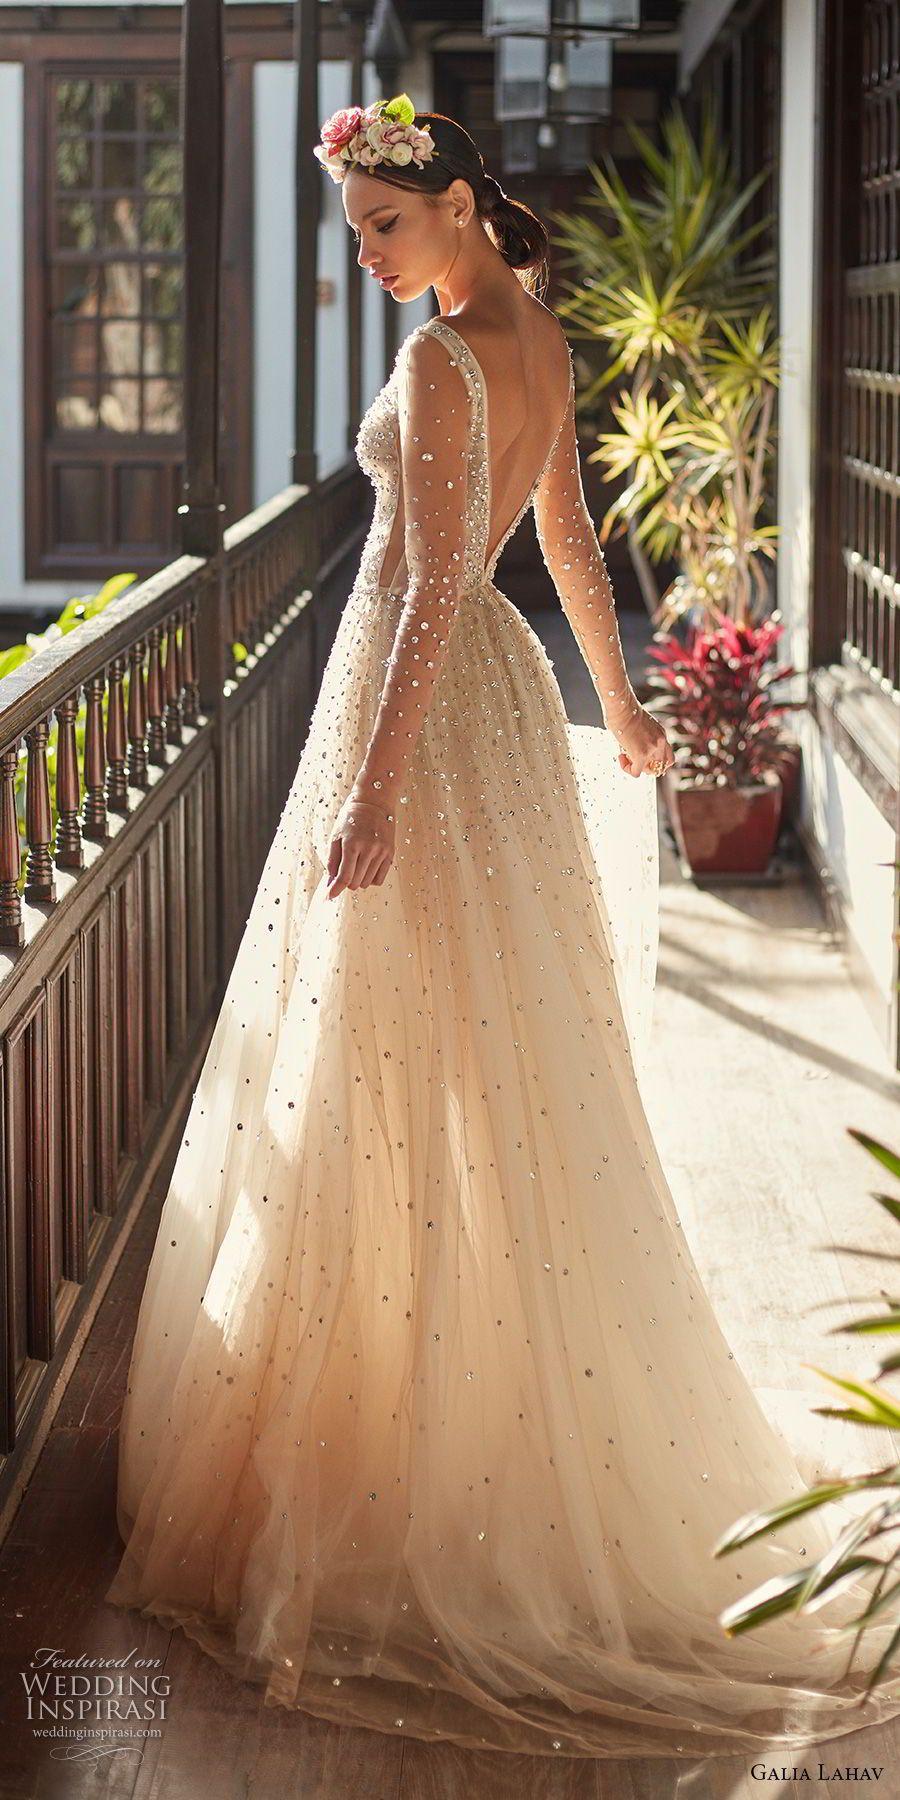 Galia lahav couture fall wedding dresses u ucflorence by night